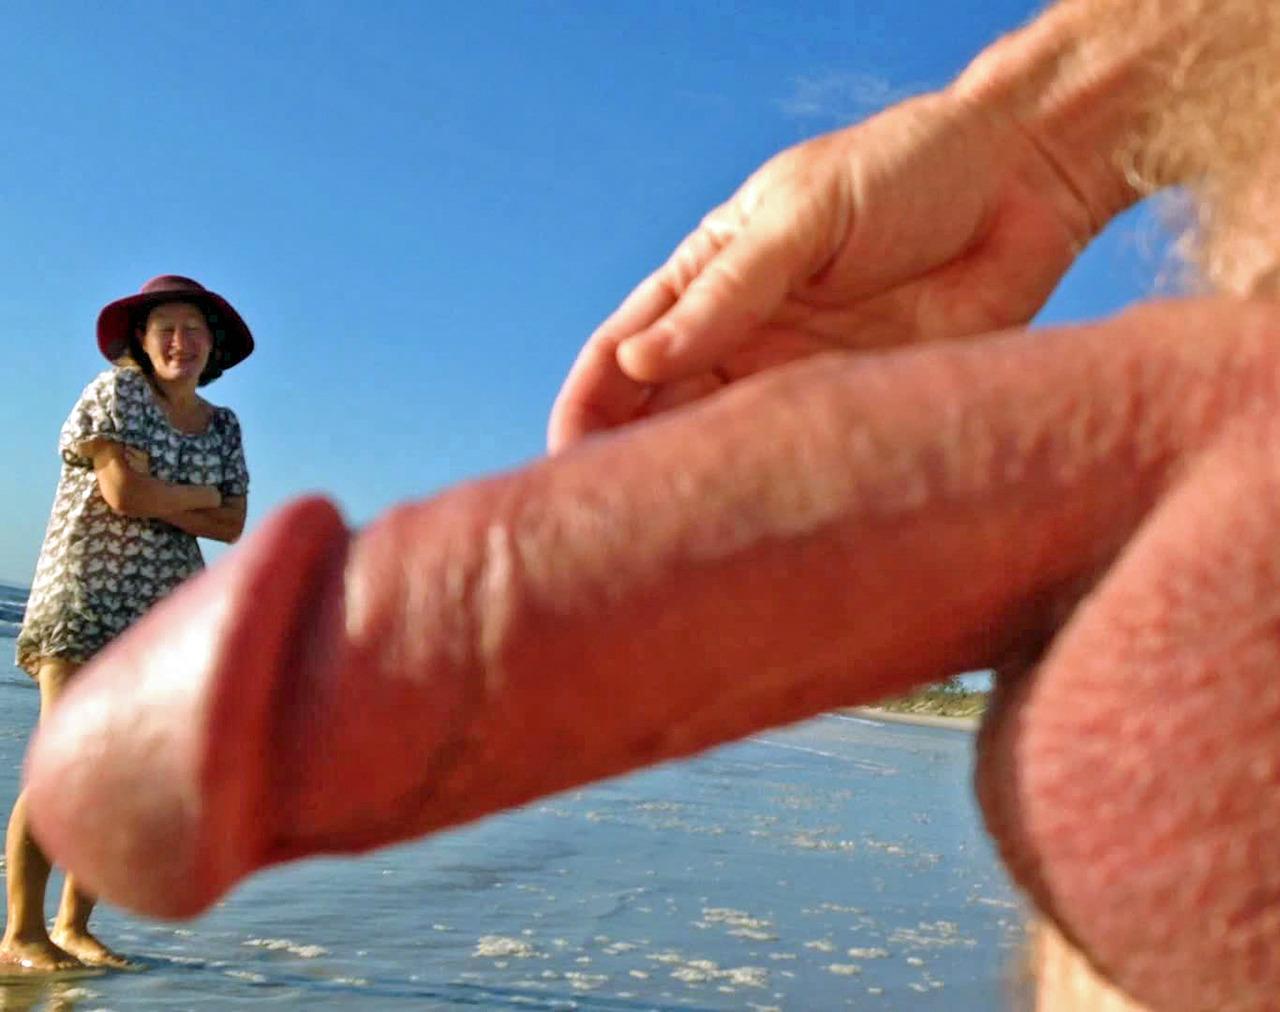 Talk, cfnm boner nude beach erection cheaply got